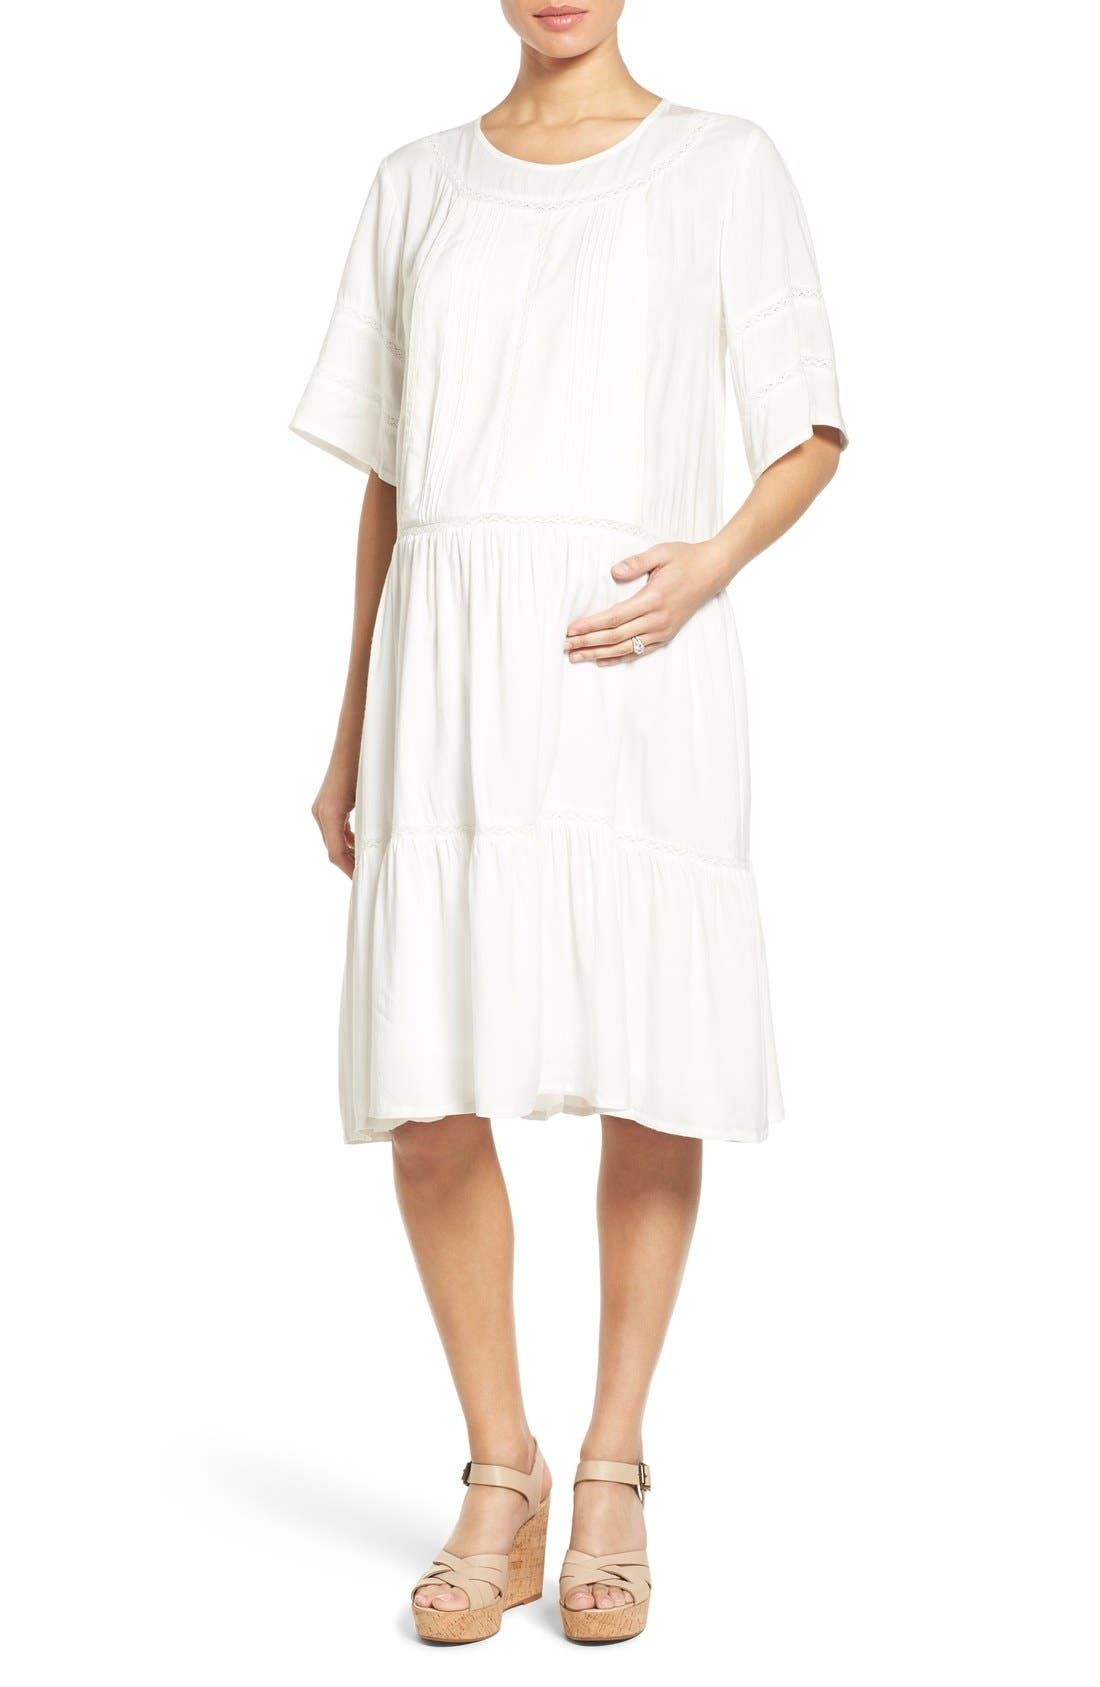 Fillyboo 'Wild at Heart' Maternity/Nursing Midi Dress